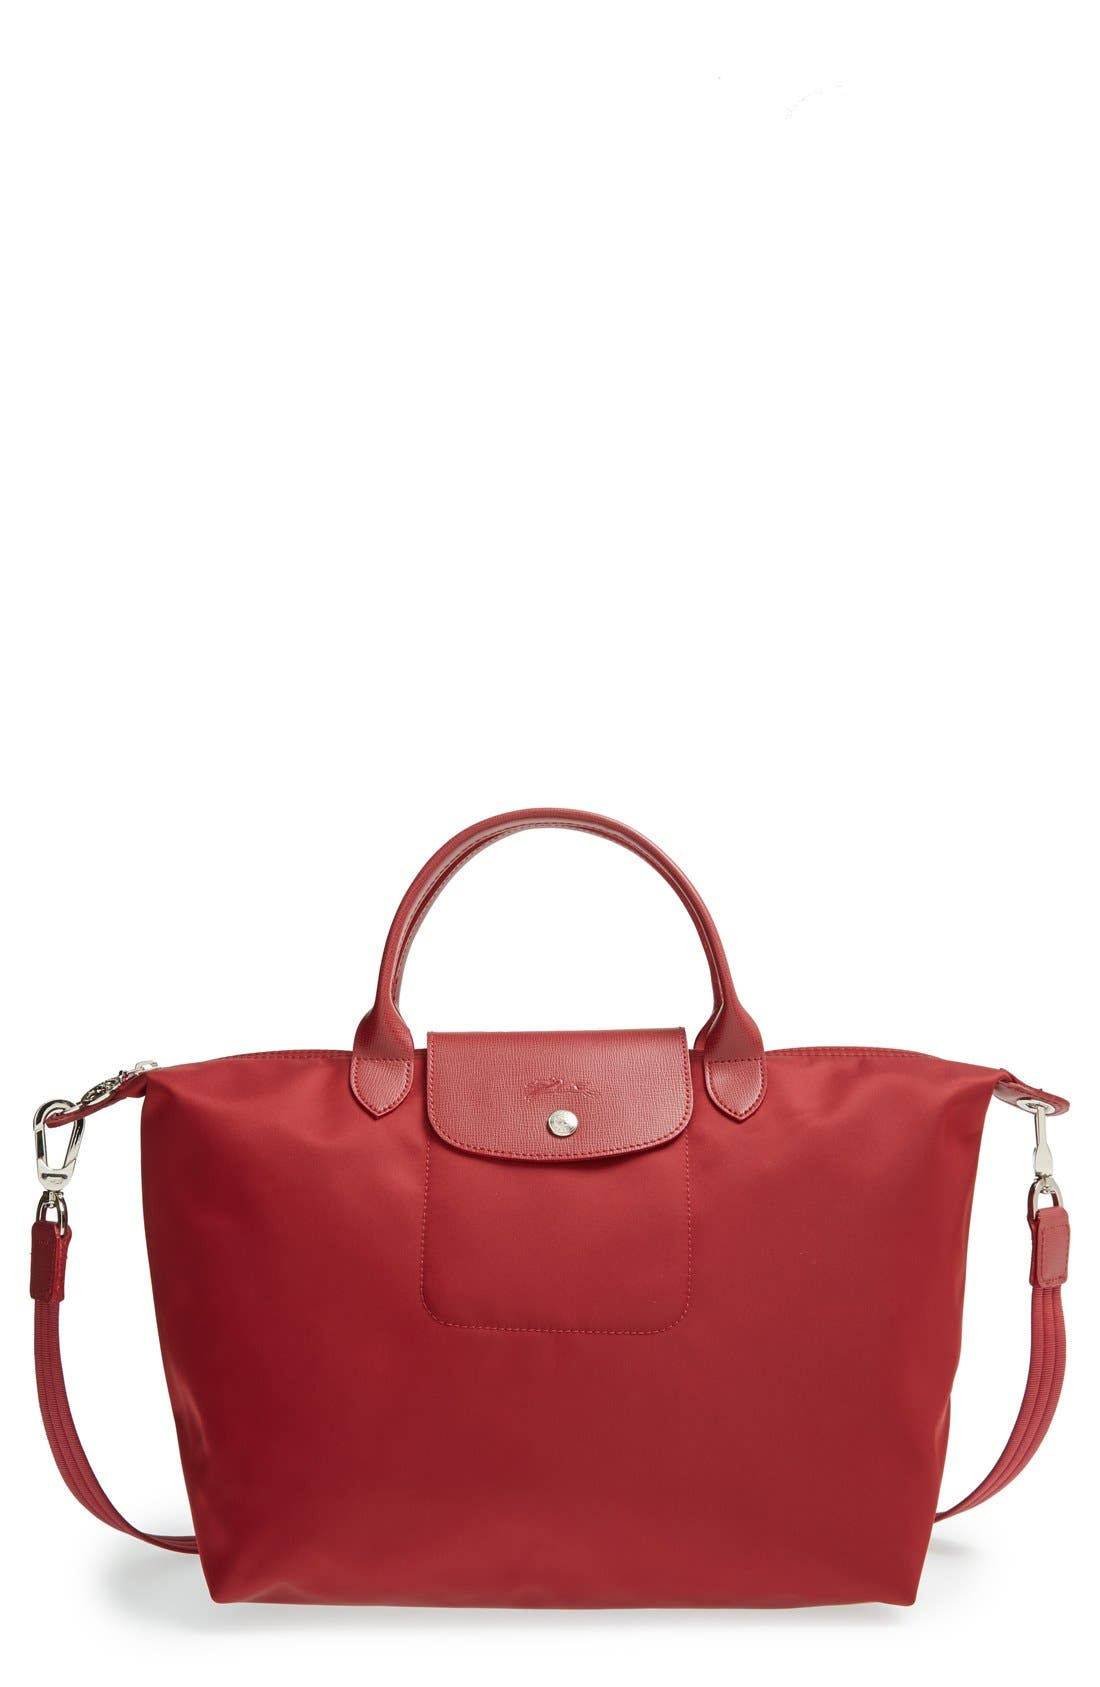 Main Image - Longchamp 'Medium Le Pliage Neo' Nylon Tote